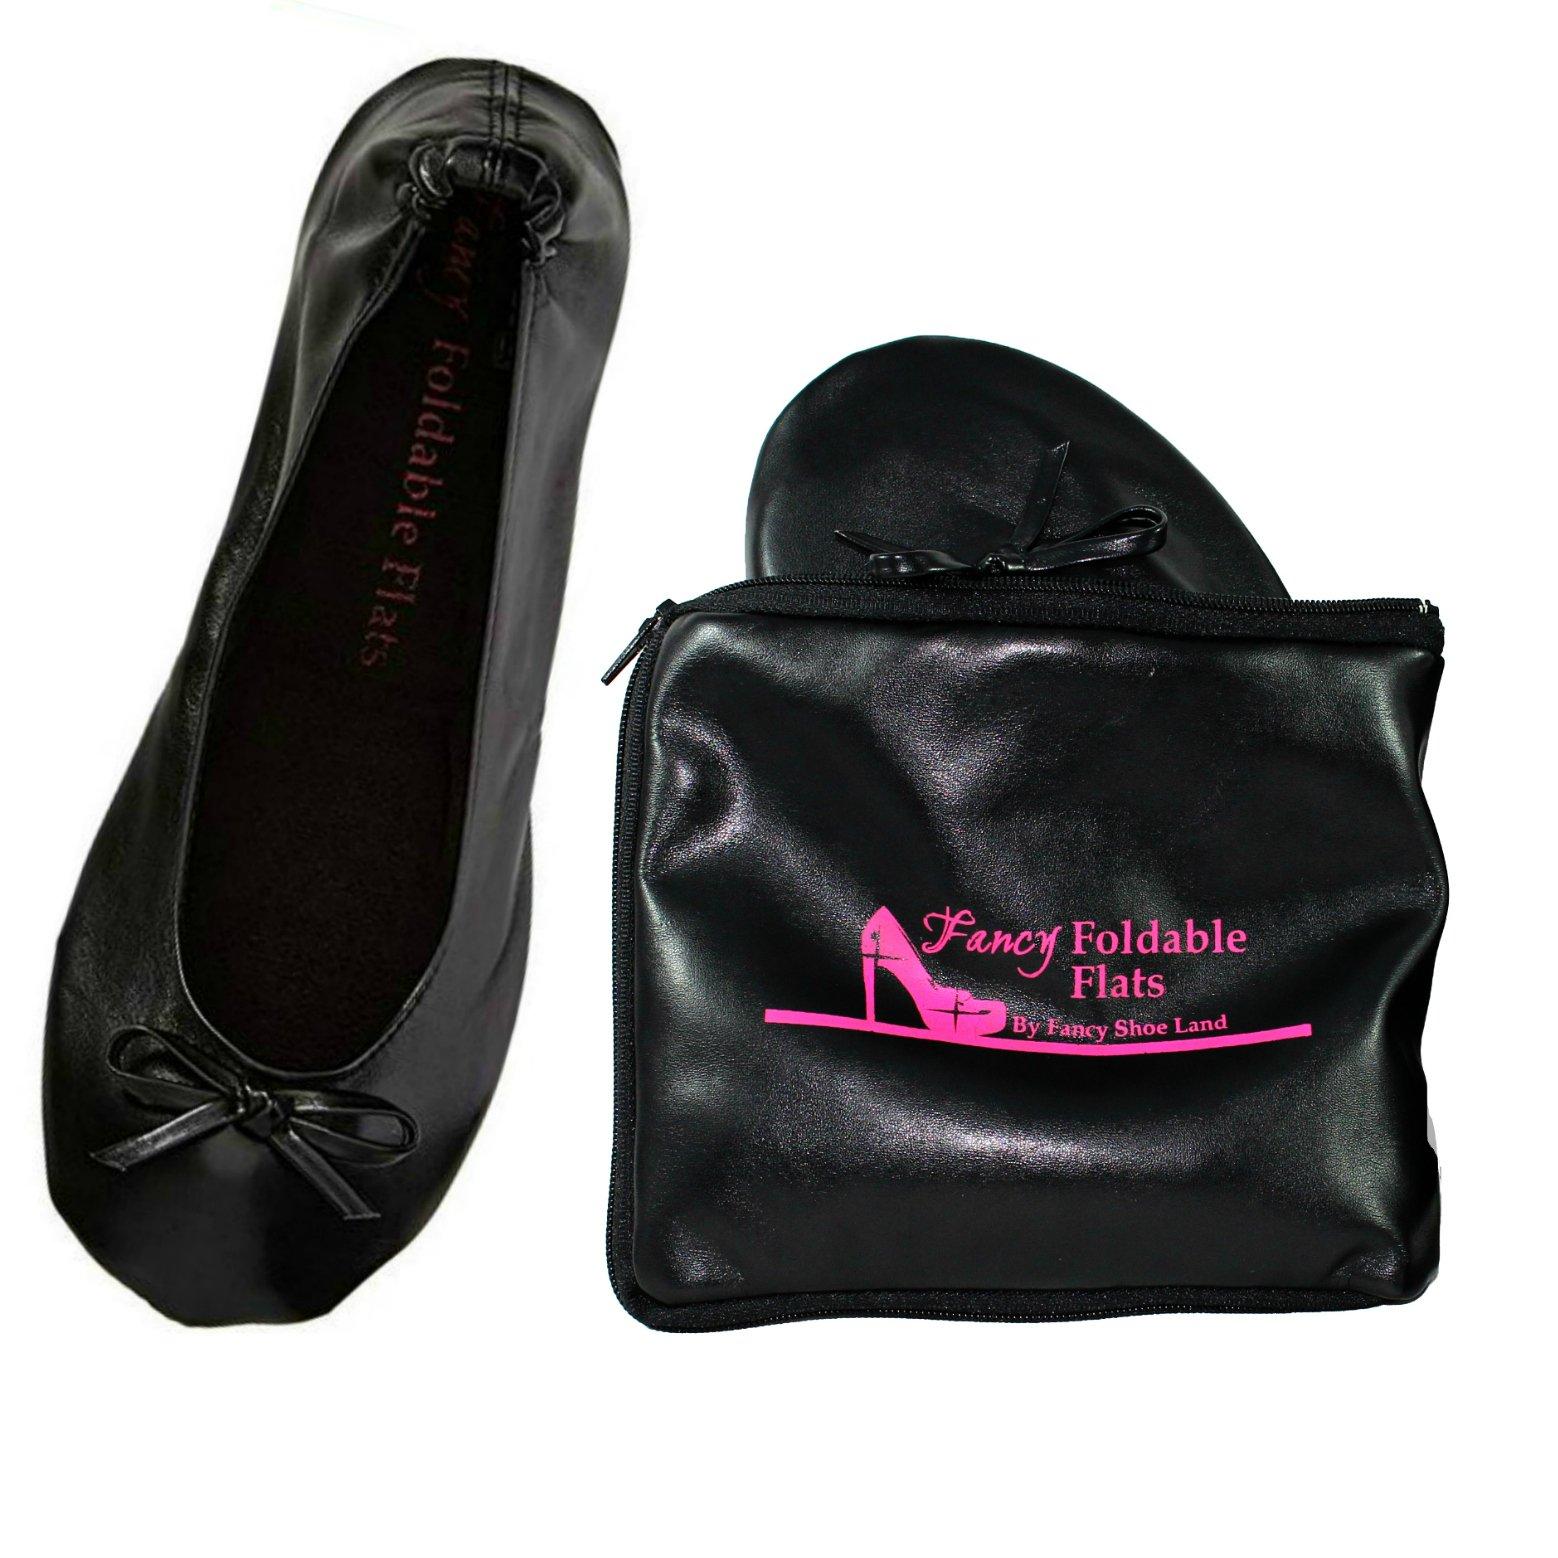 Fancy Shoe Land Foldable Ballet Flats Expandable Tote Bag for High Heels Black Travel Fold up or Folding Shoes